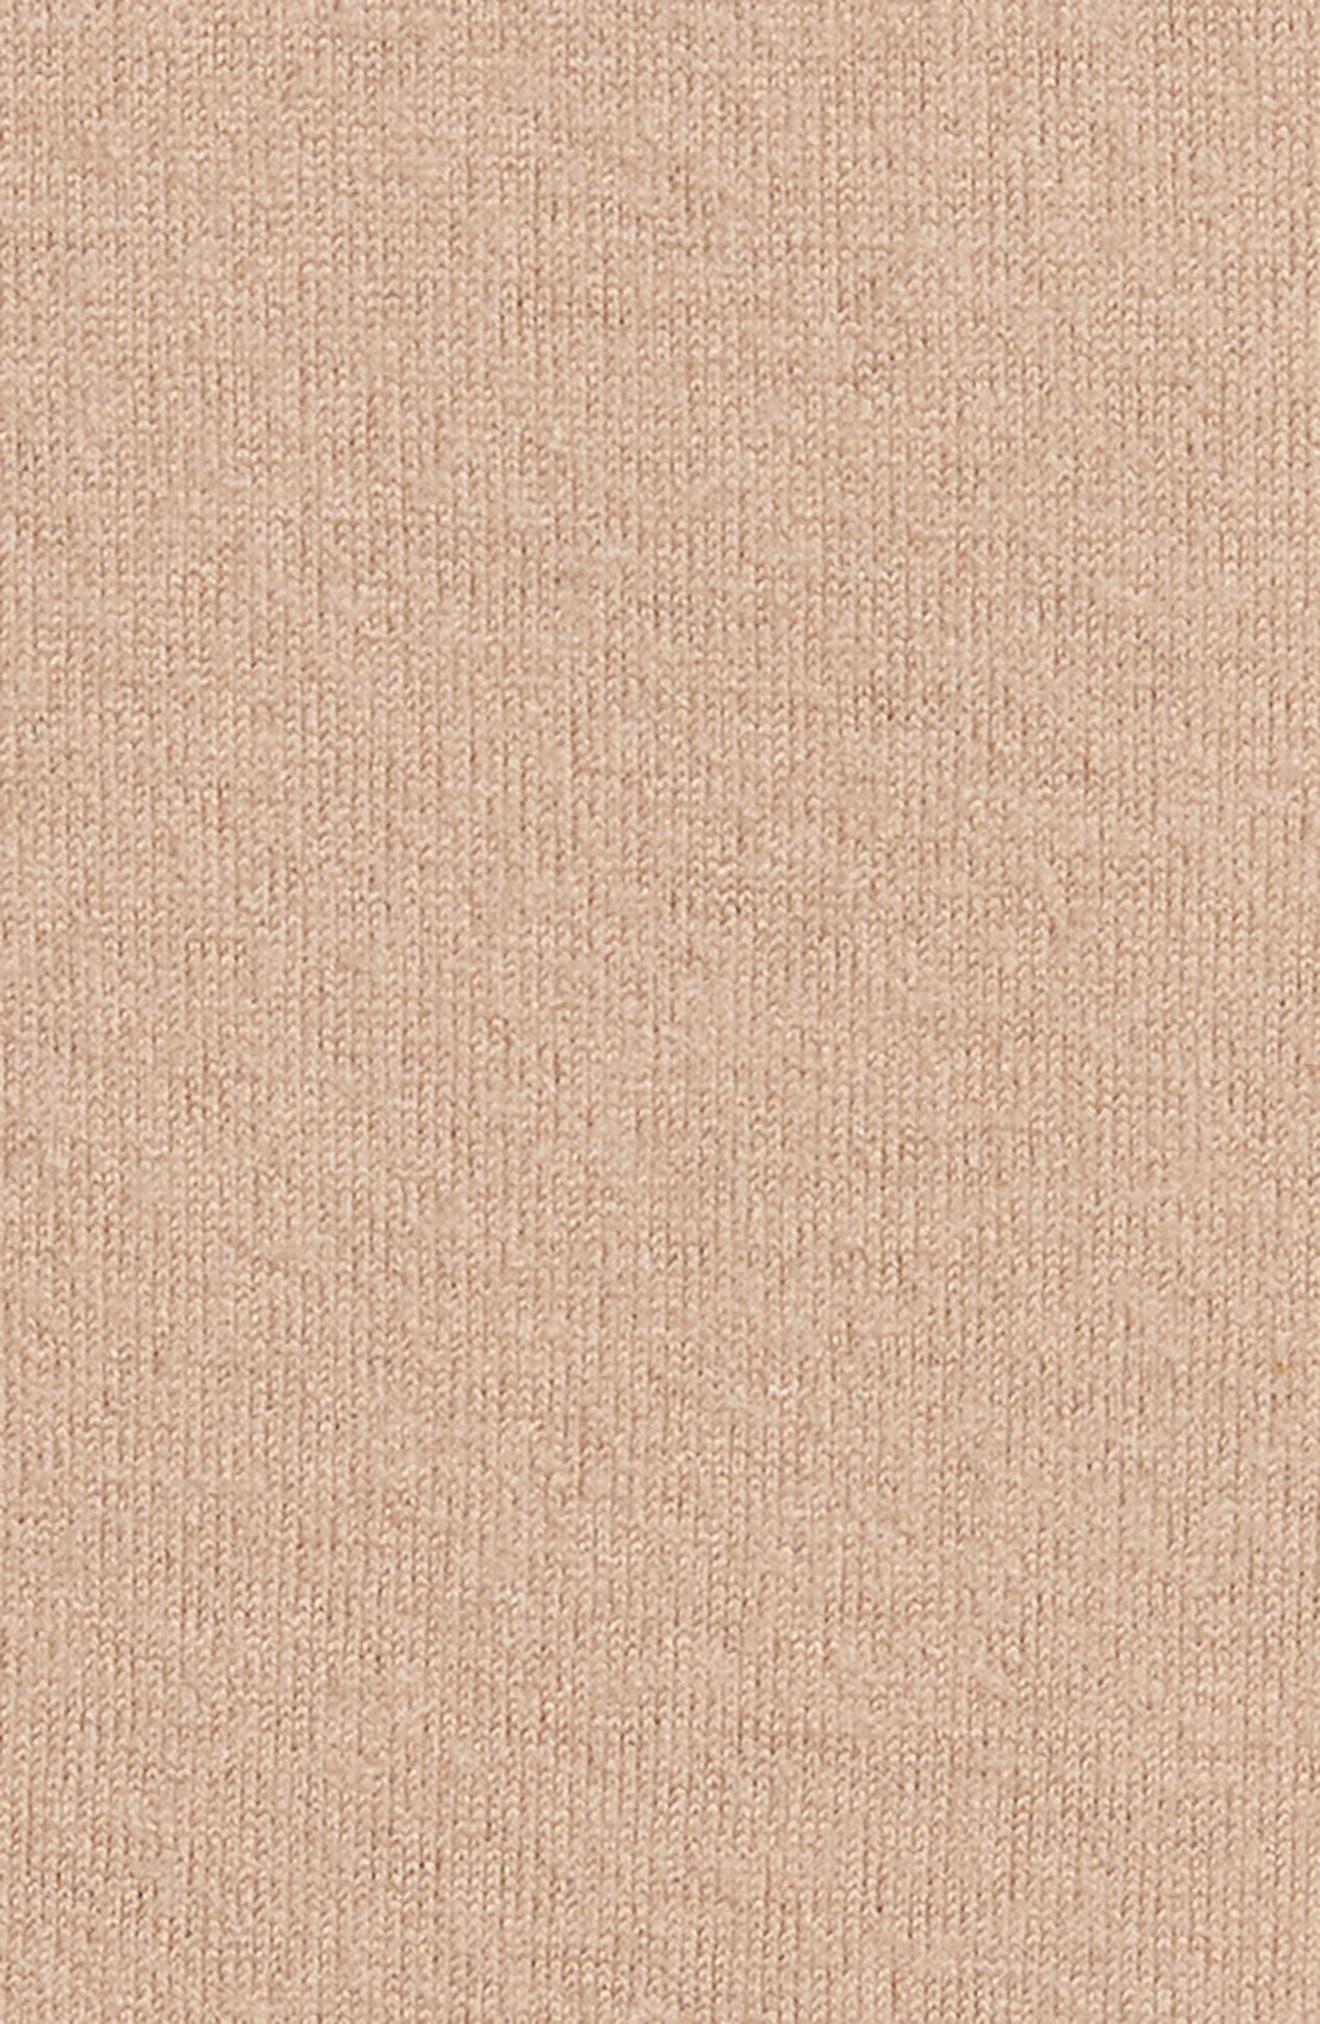 Slade Wool Blazer,                             Alternate thumbnail 6, color,                             LIGHT CAMEL